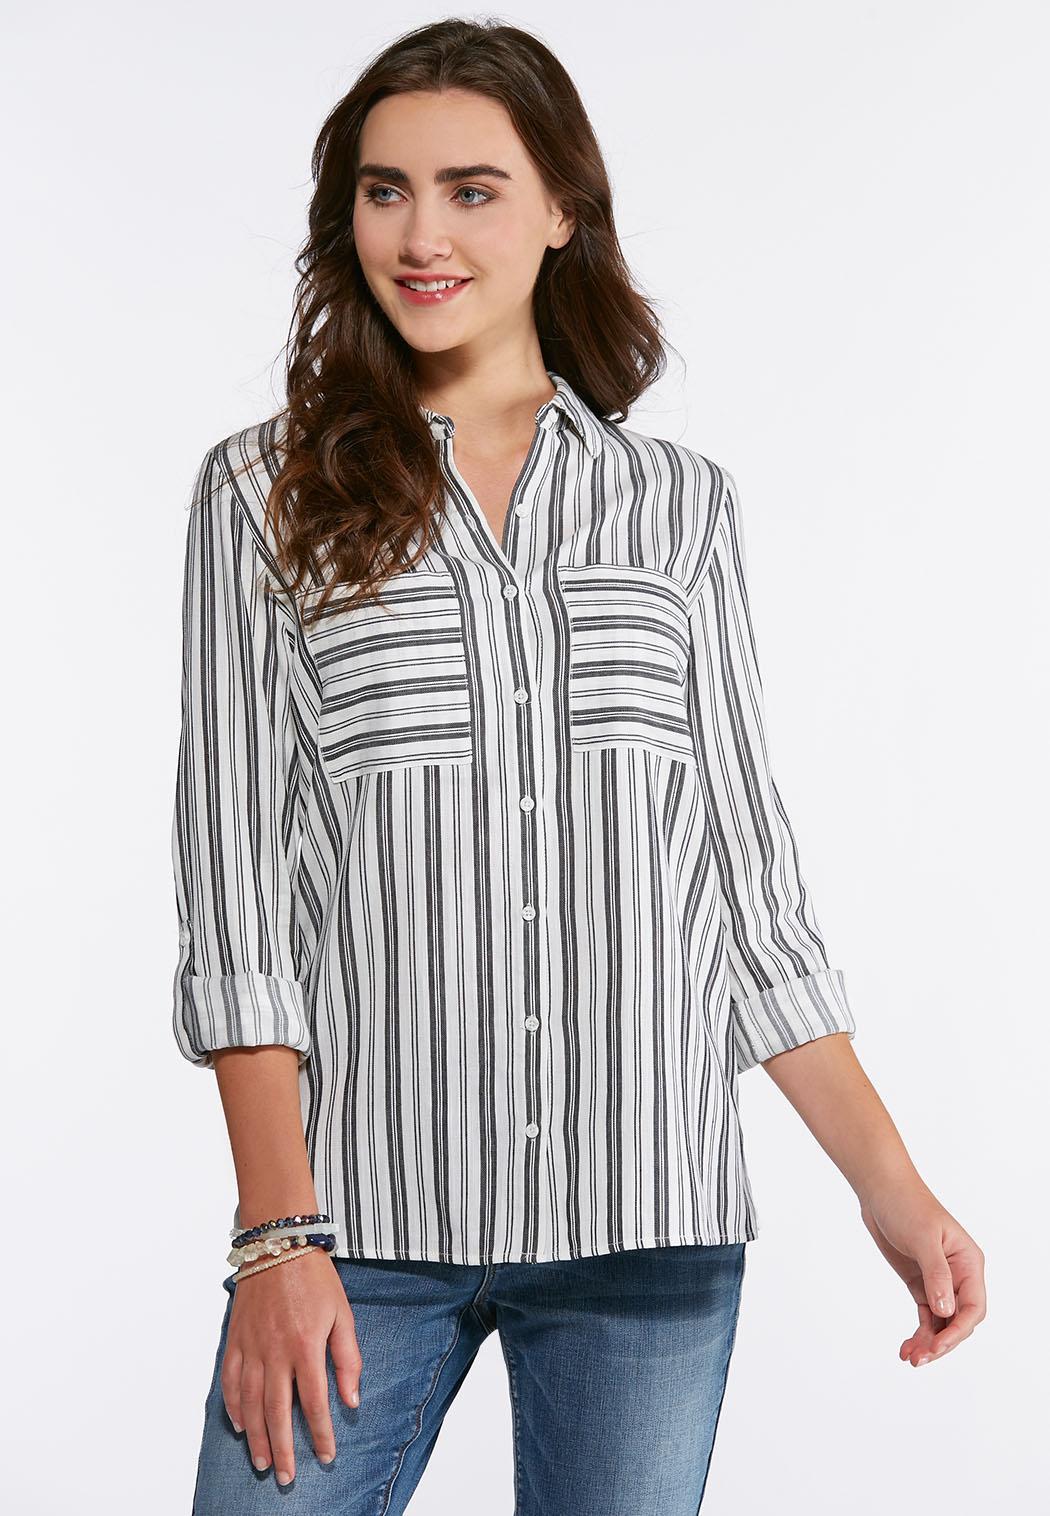 Gray Striped Shirt